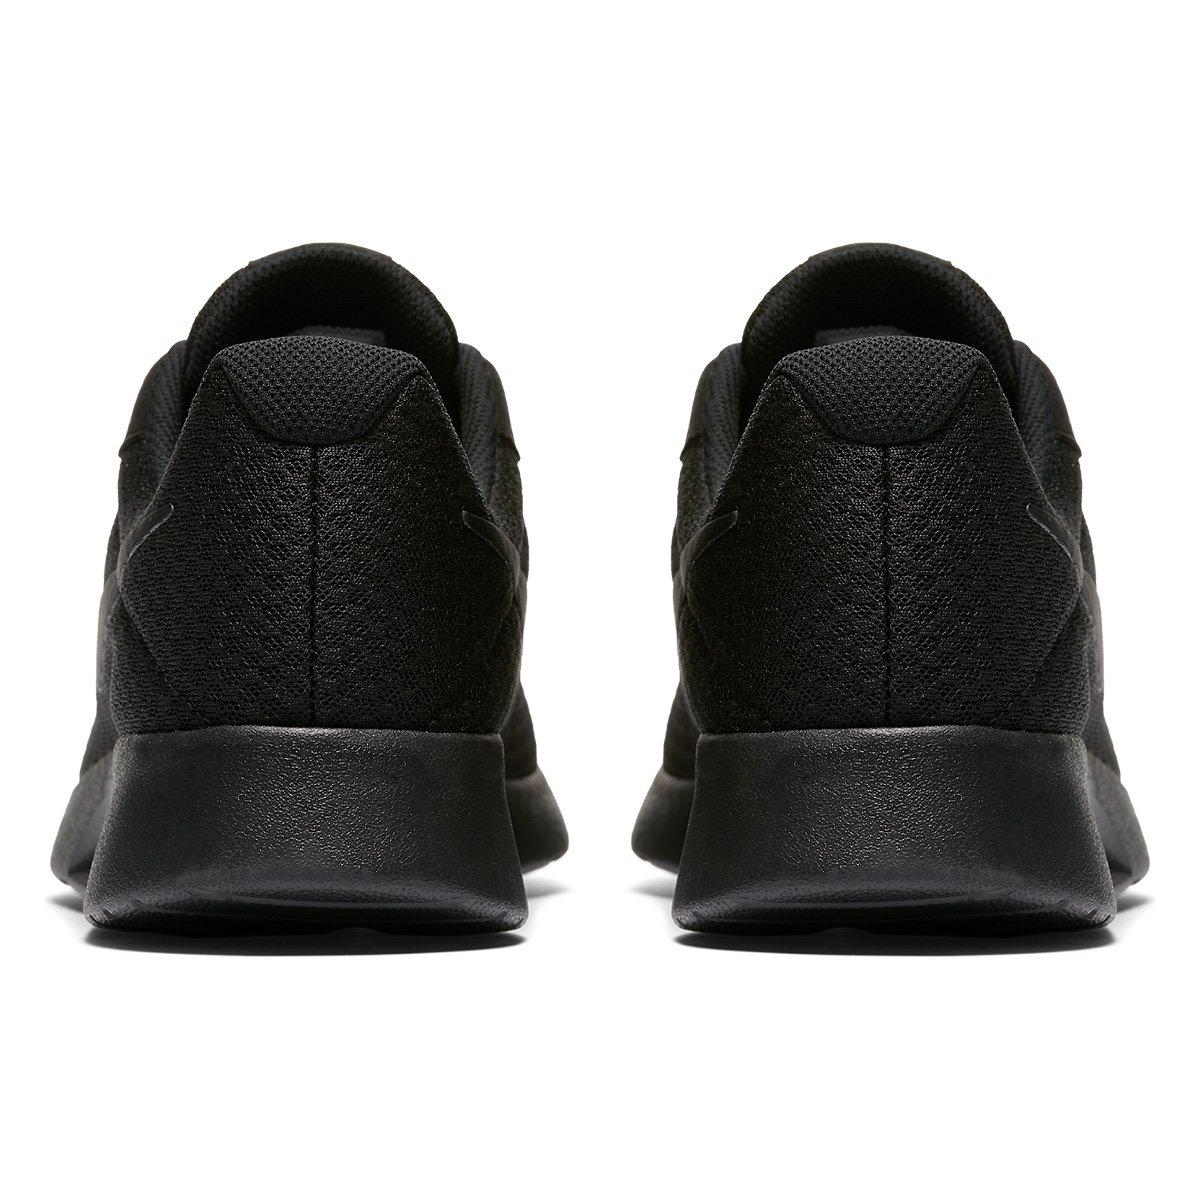 Tênis Nike Tanjun Masculino - Preto - Compre Agora  5cd0029352a80